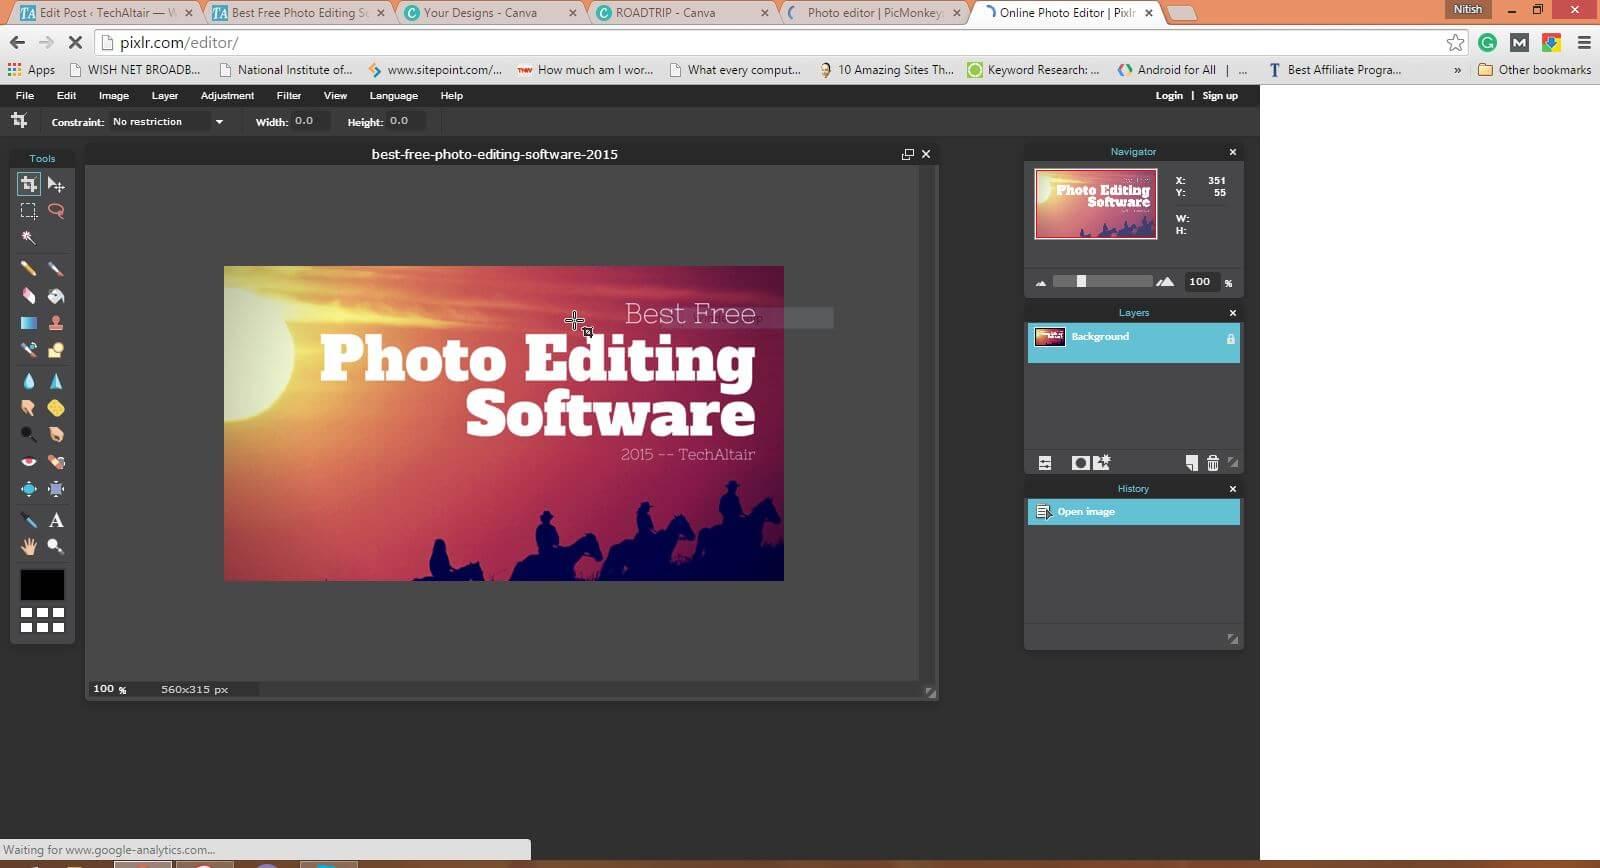 Best Free Photo Editing Software 2015 Techaltair